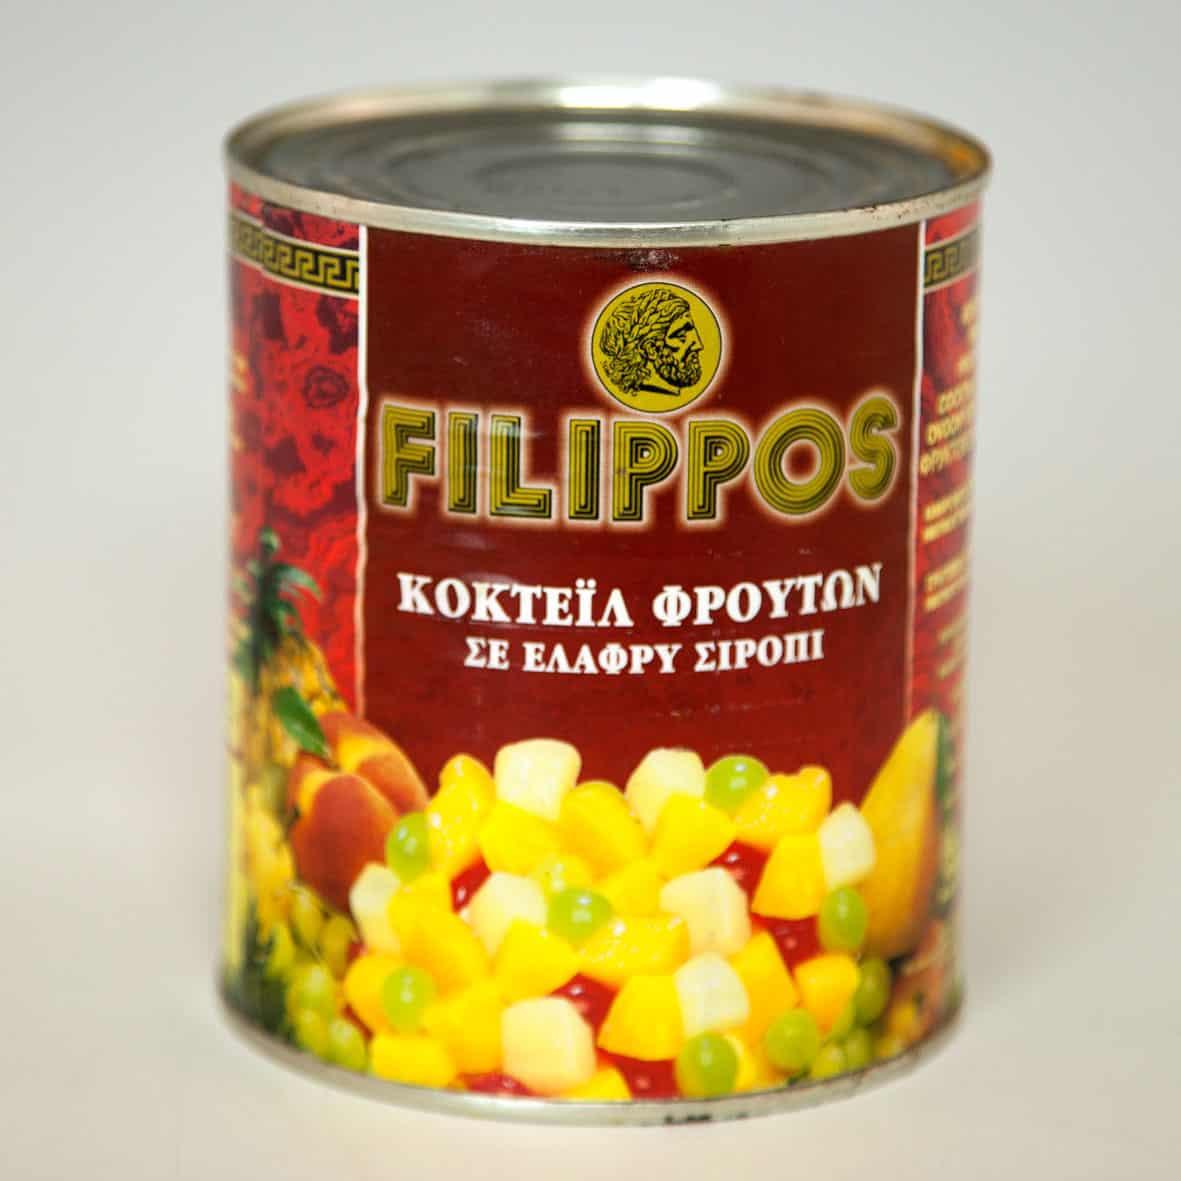 Filipos Kompot Voćni mix 425ml